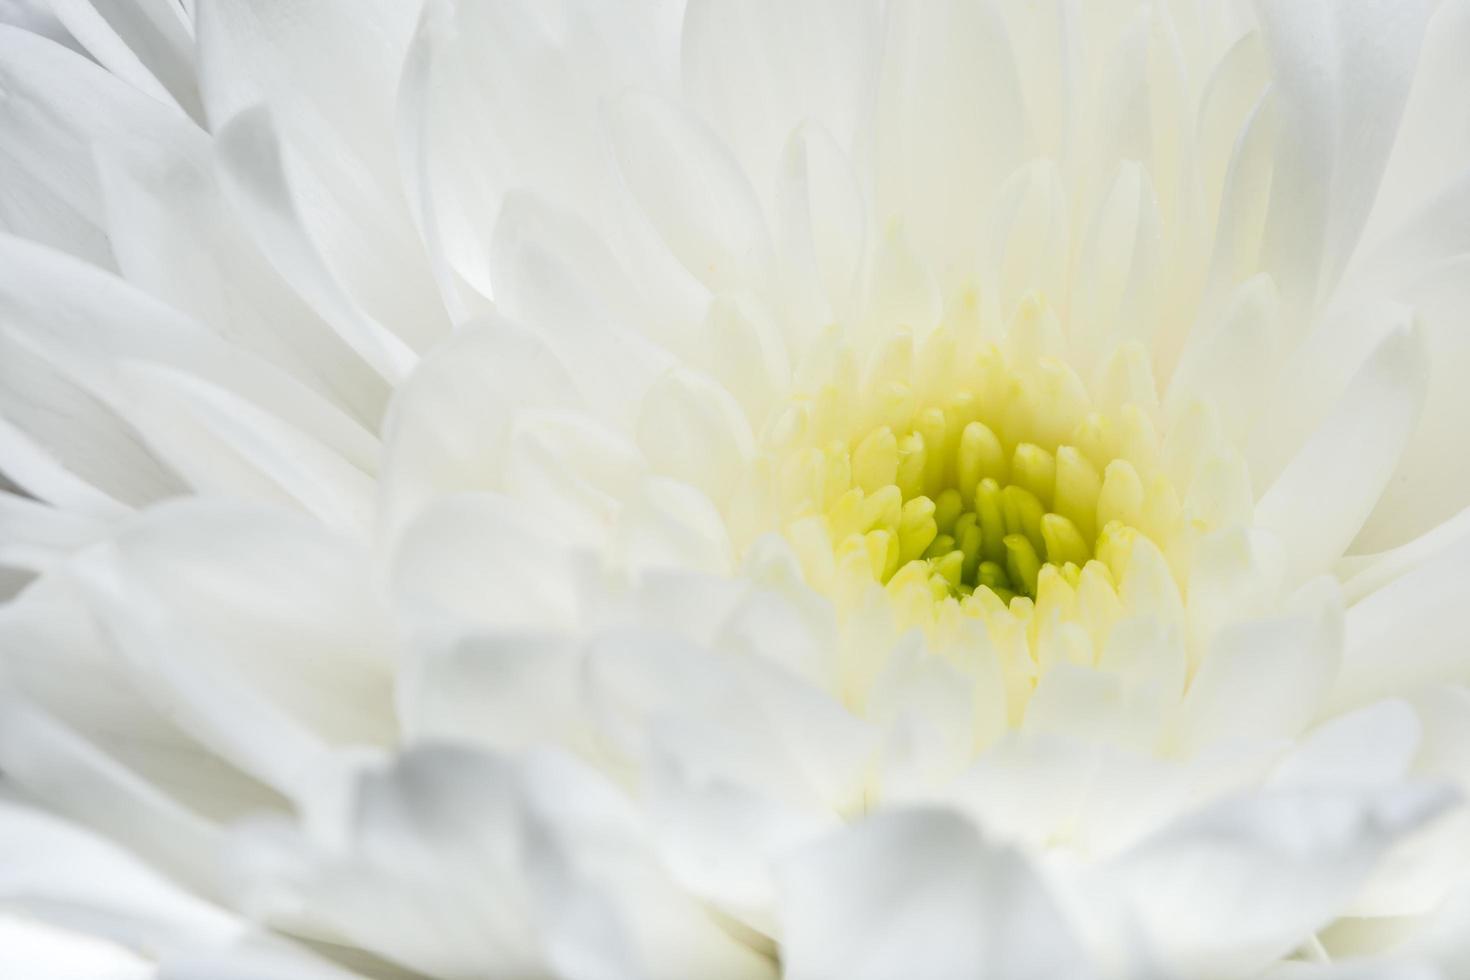 Chrysantheme weiße Blume Nahaufnahme foto